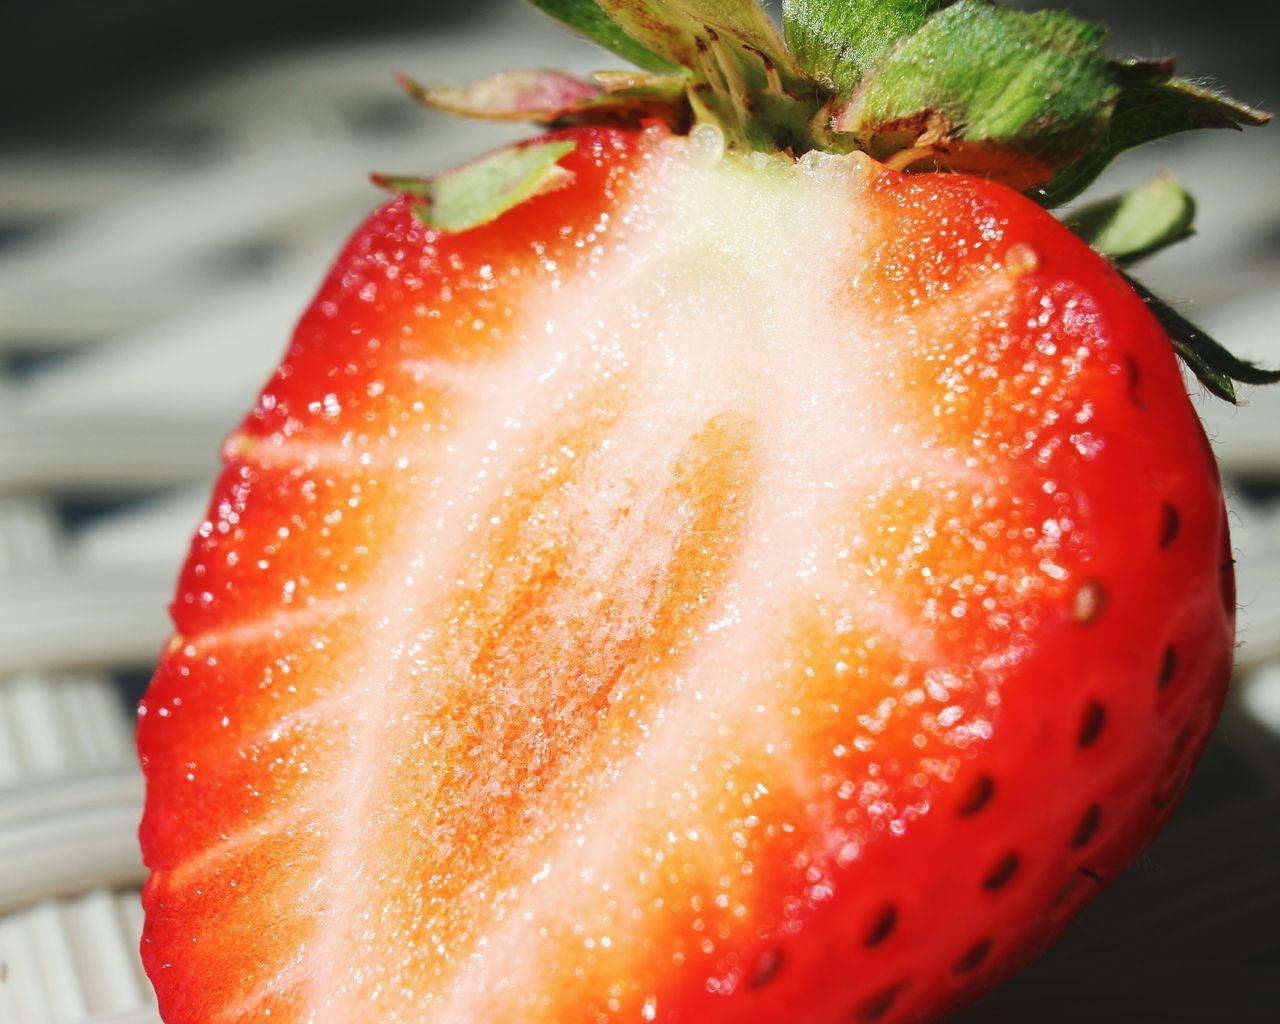 Close-Up Of Sliced Strawberry